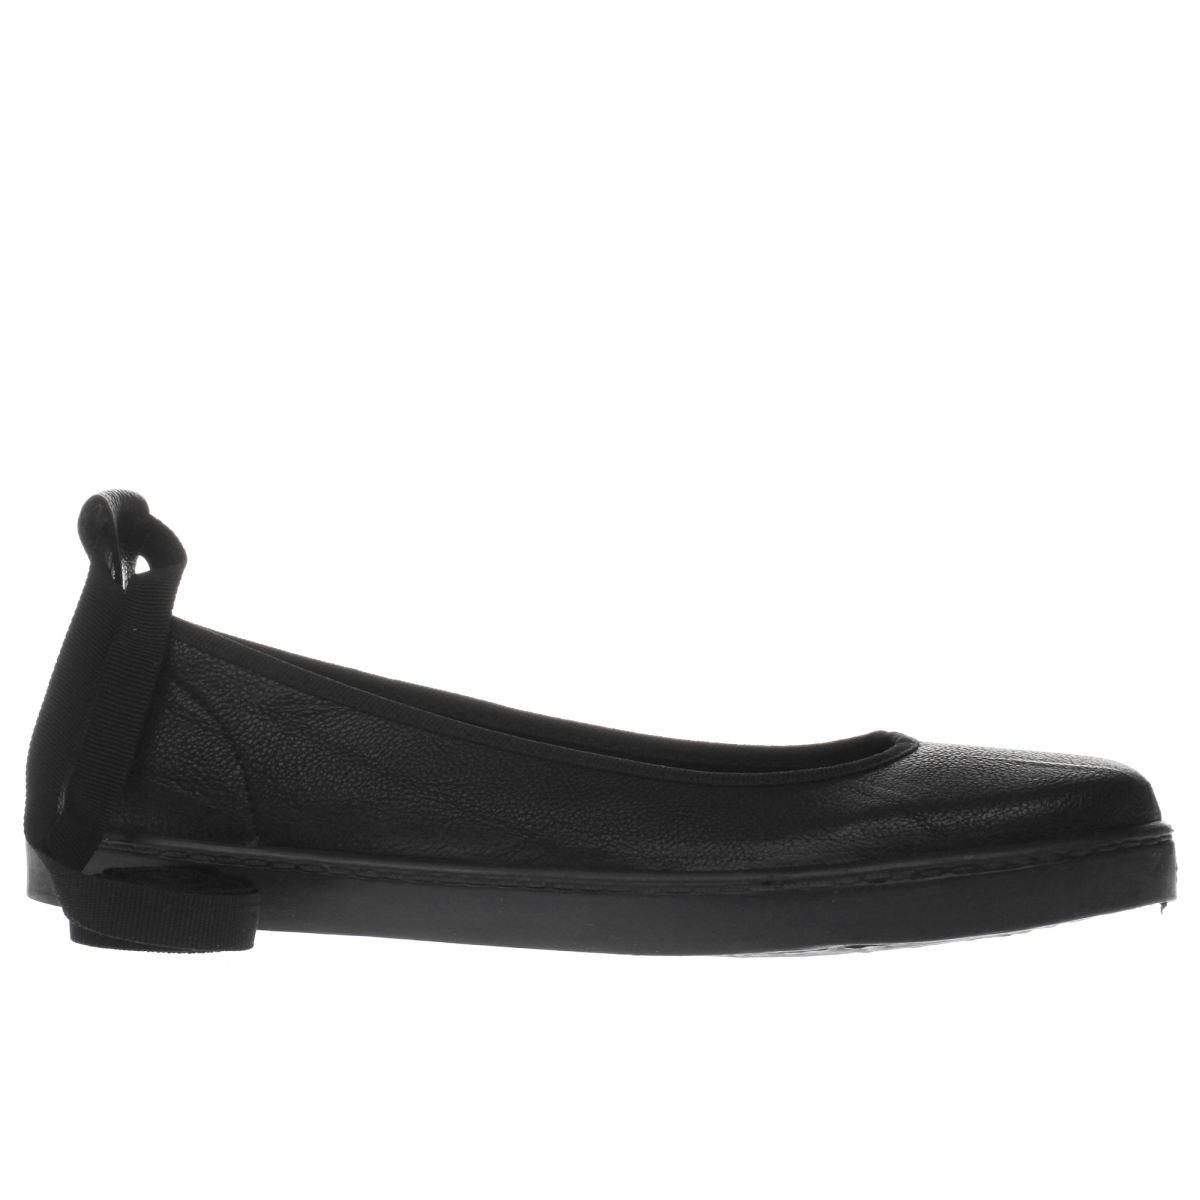 schuh black prance flat shoes